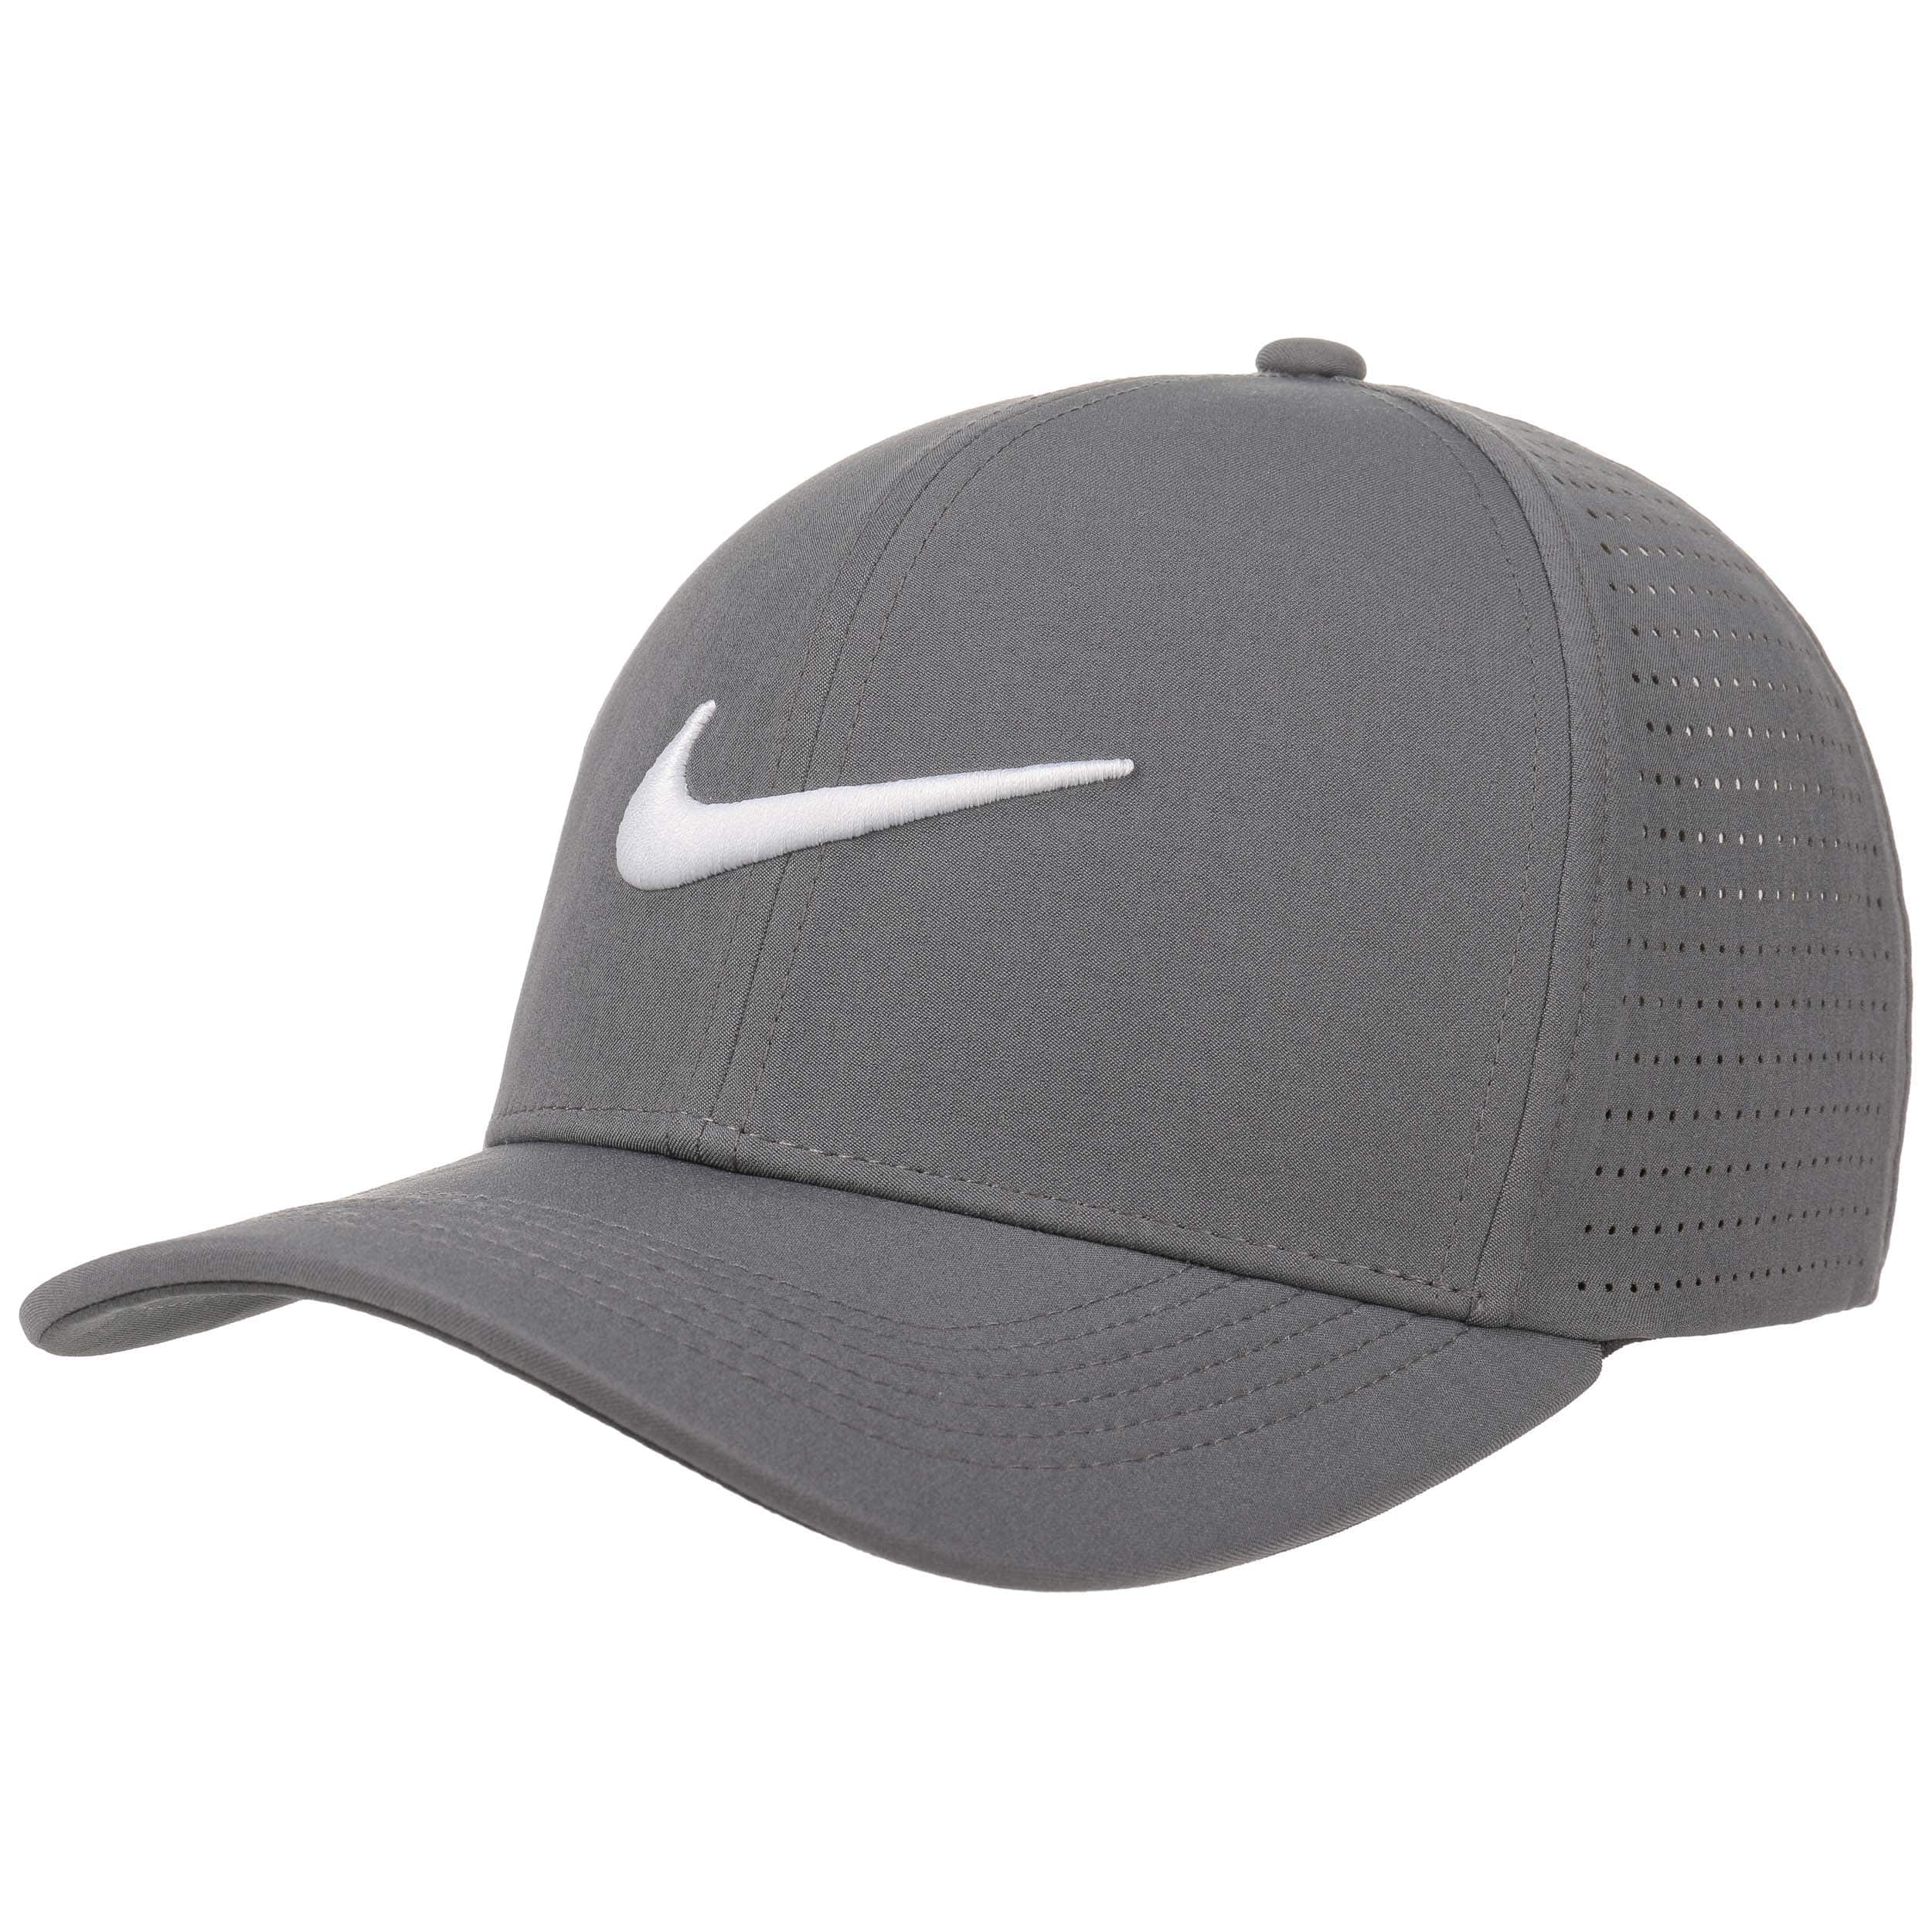 Gorra Golf Classic 99 Baseball by Nike - Gorras - sombreroshop.es cb9323e26c5